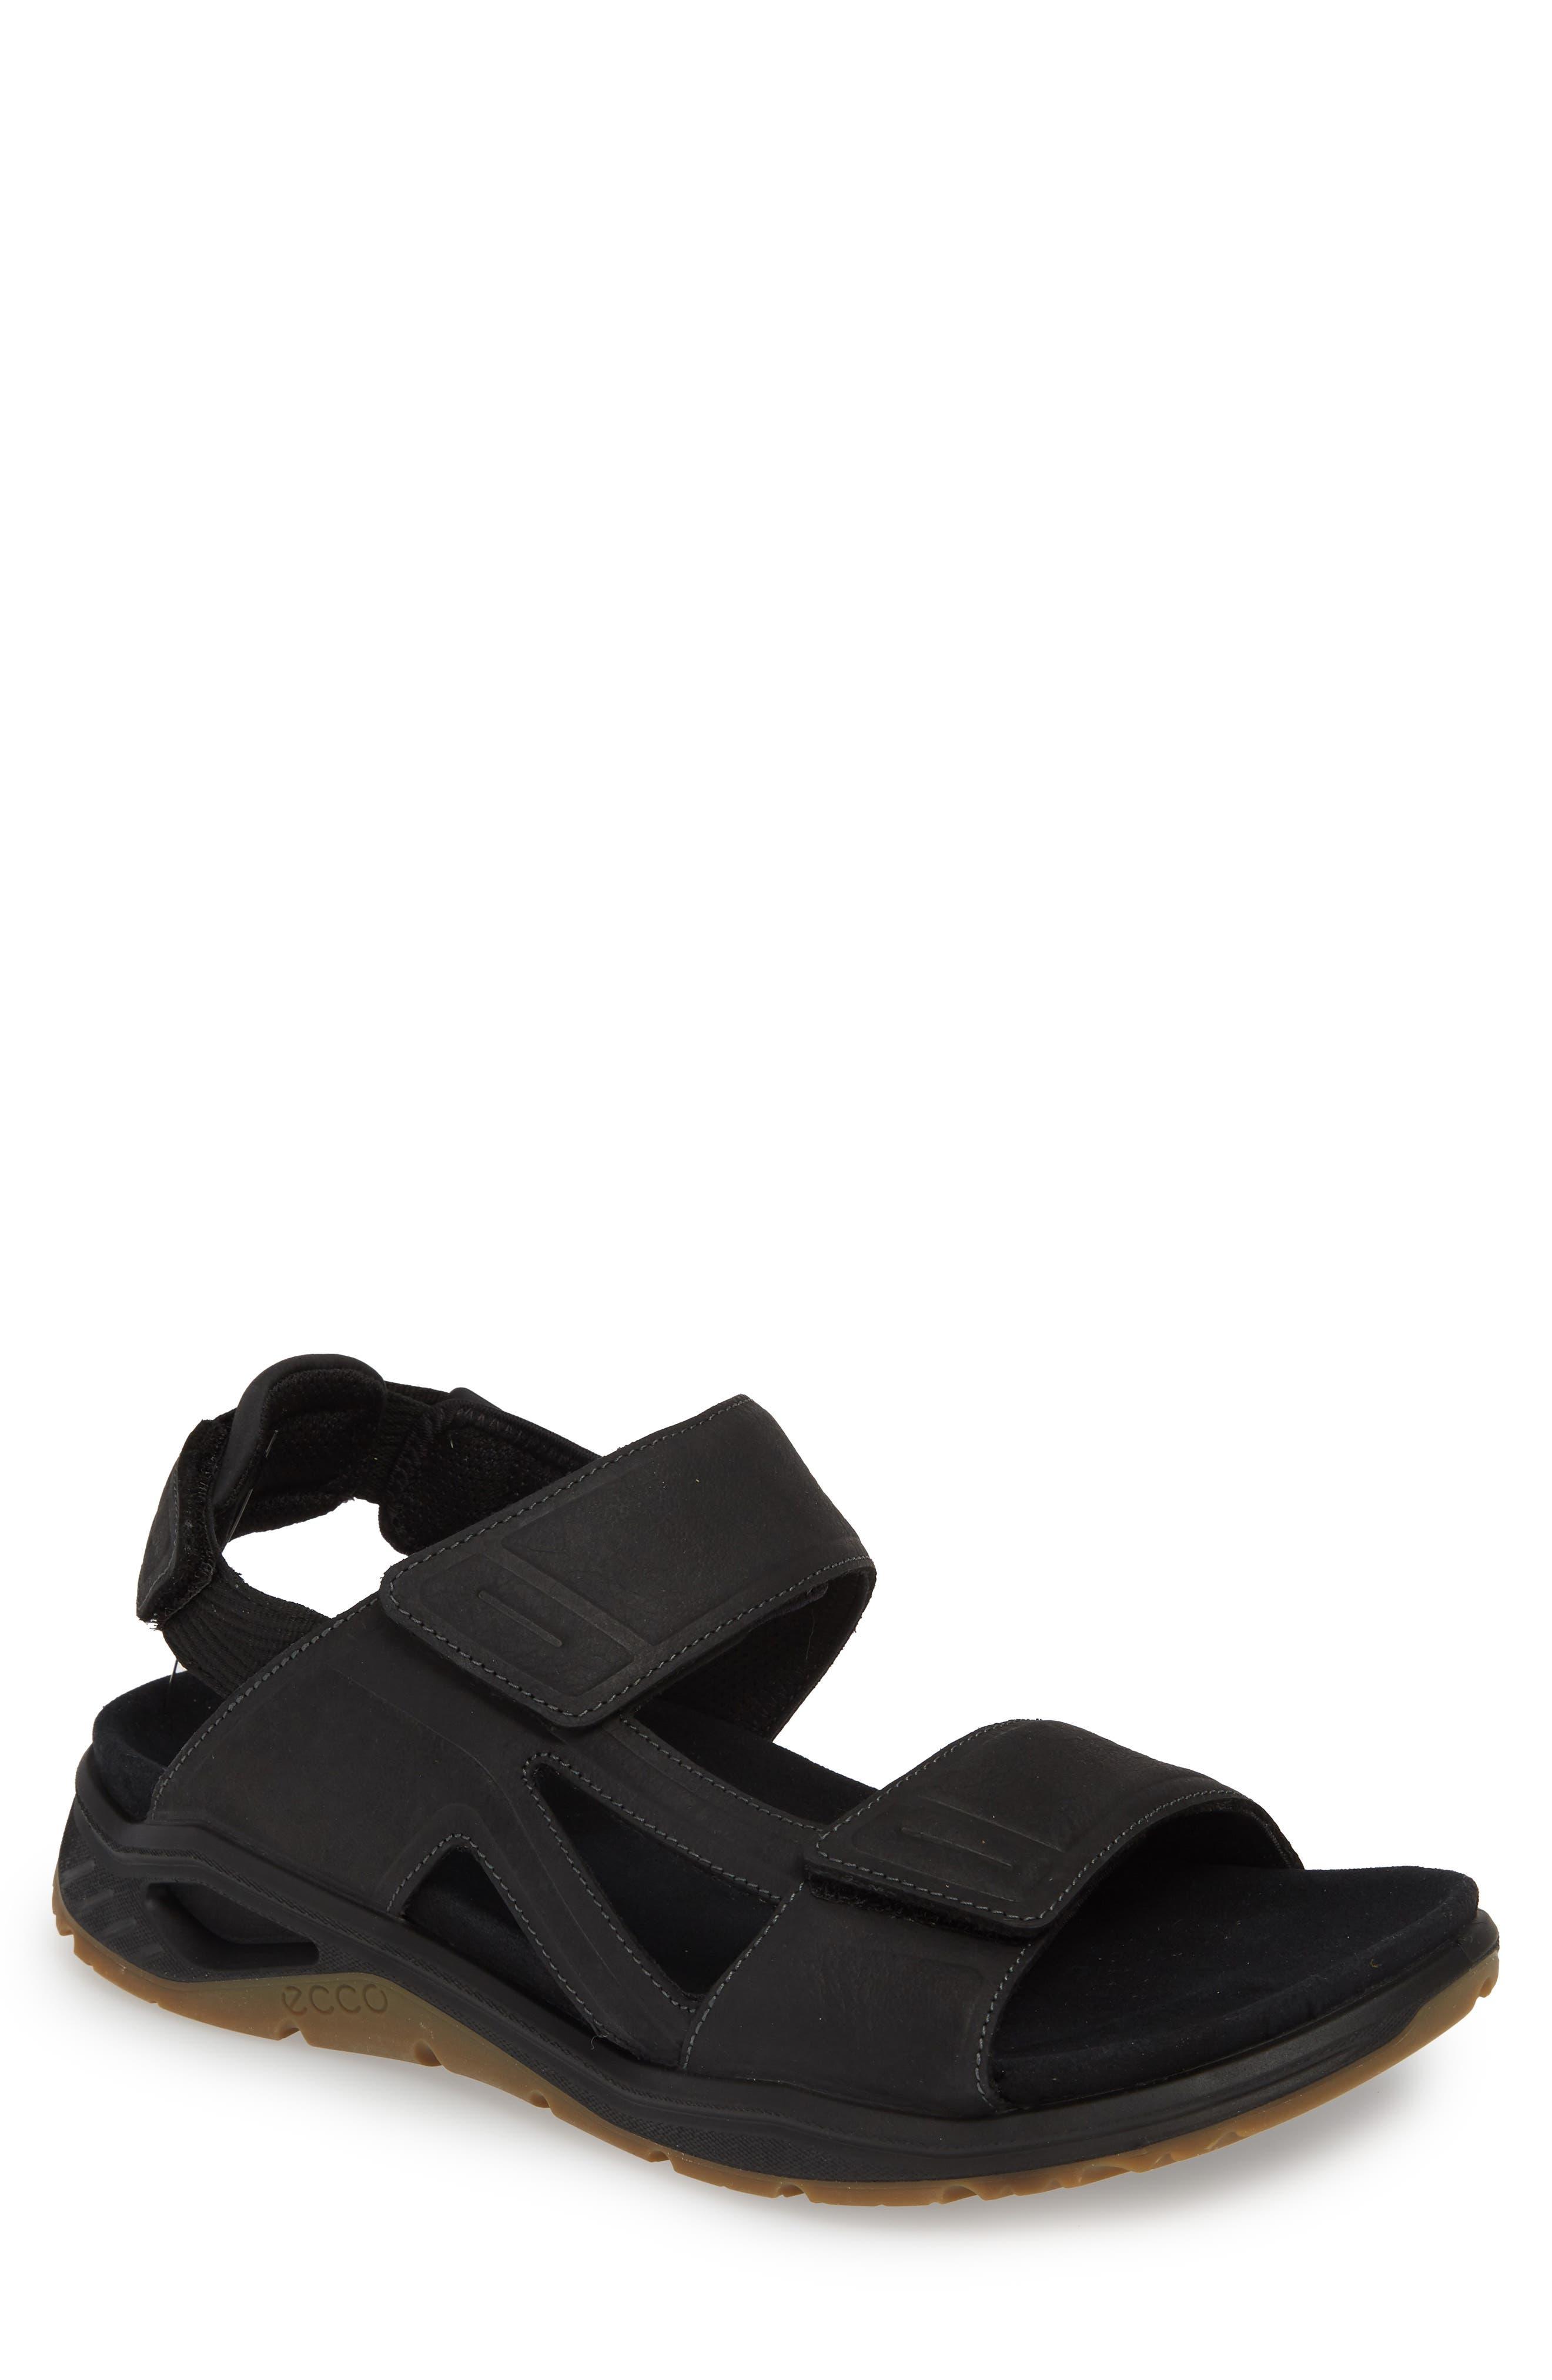 UPC 809704880655 product image for Men's Ecco X-Trinsic Sandal, Size 14-14.5US / 48EU - Beige | upcitemdb.com